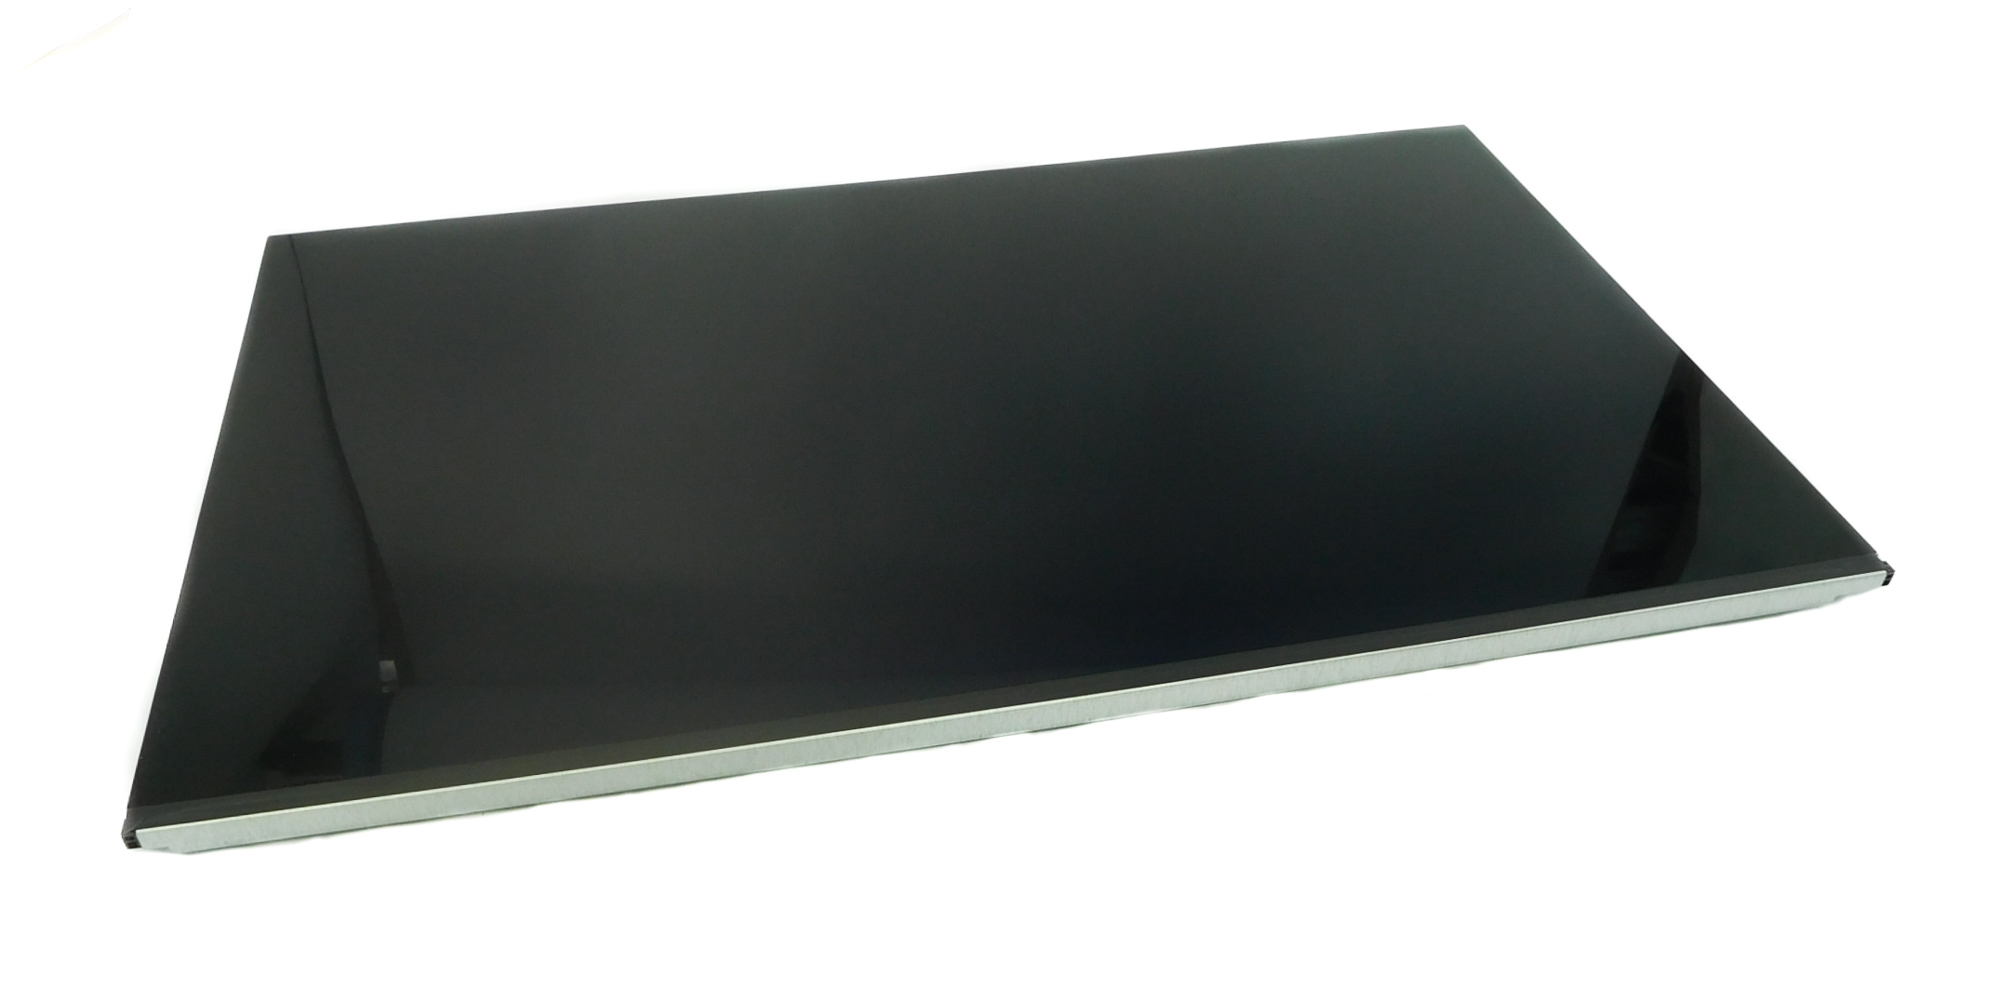 Innolux M238HCA-L3Z FHD Screen LCD Panel /f HP Pavilion 24-xa0005na AiO PC